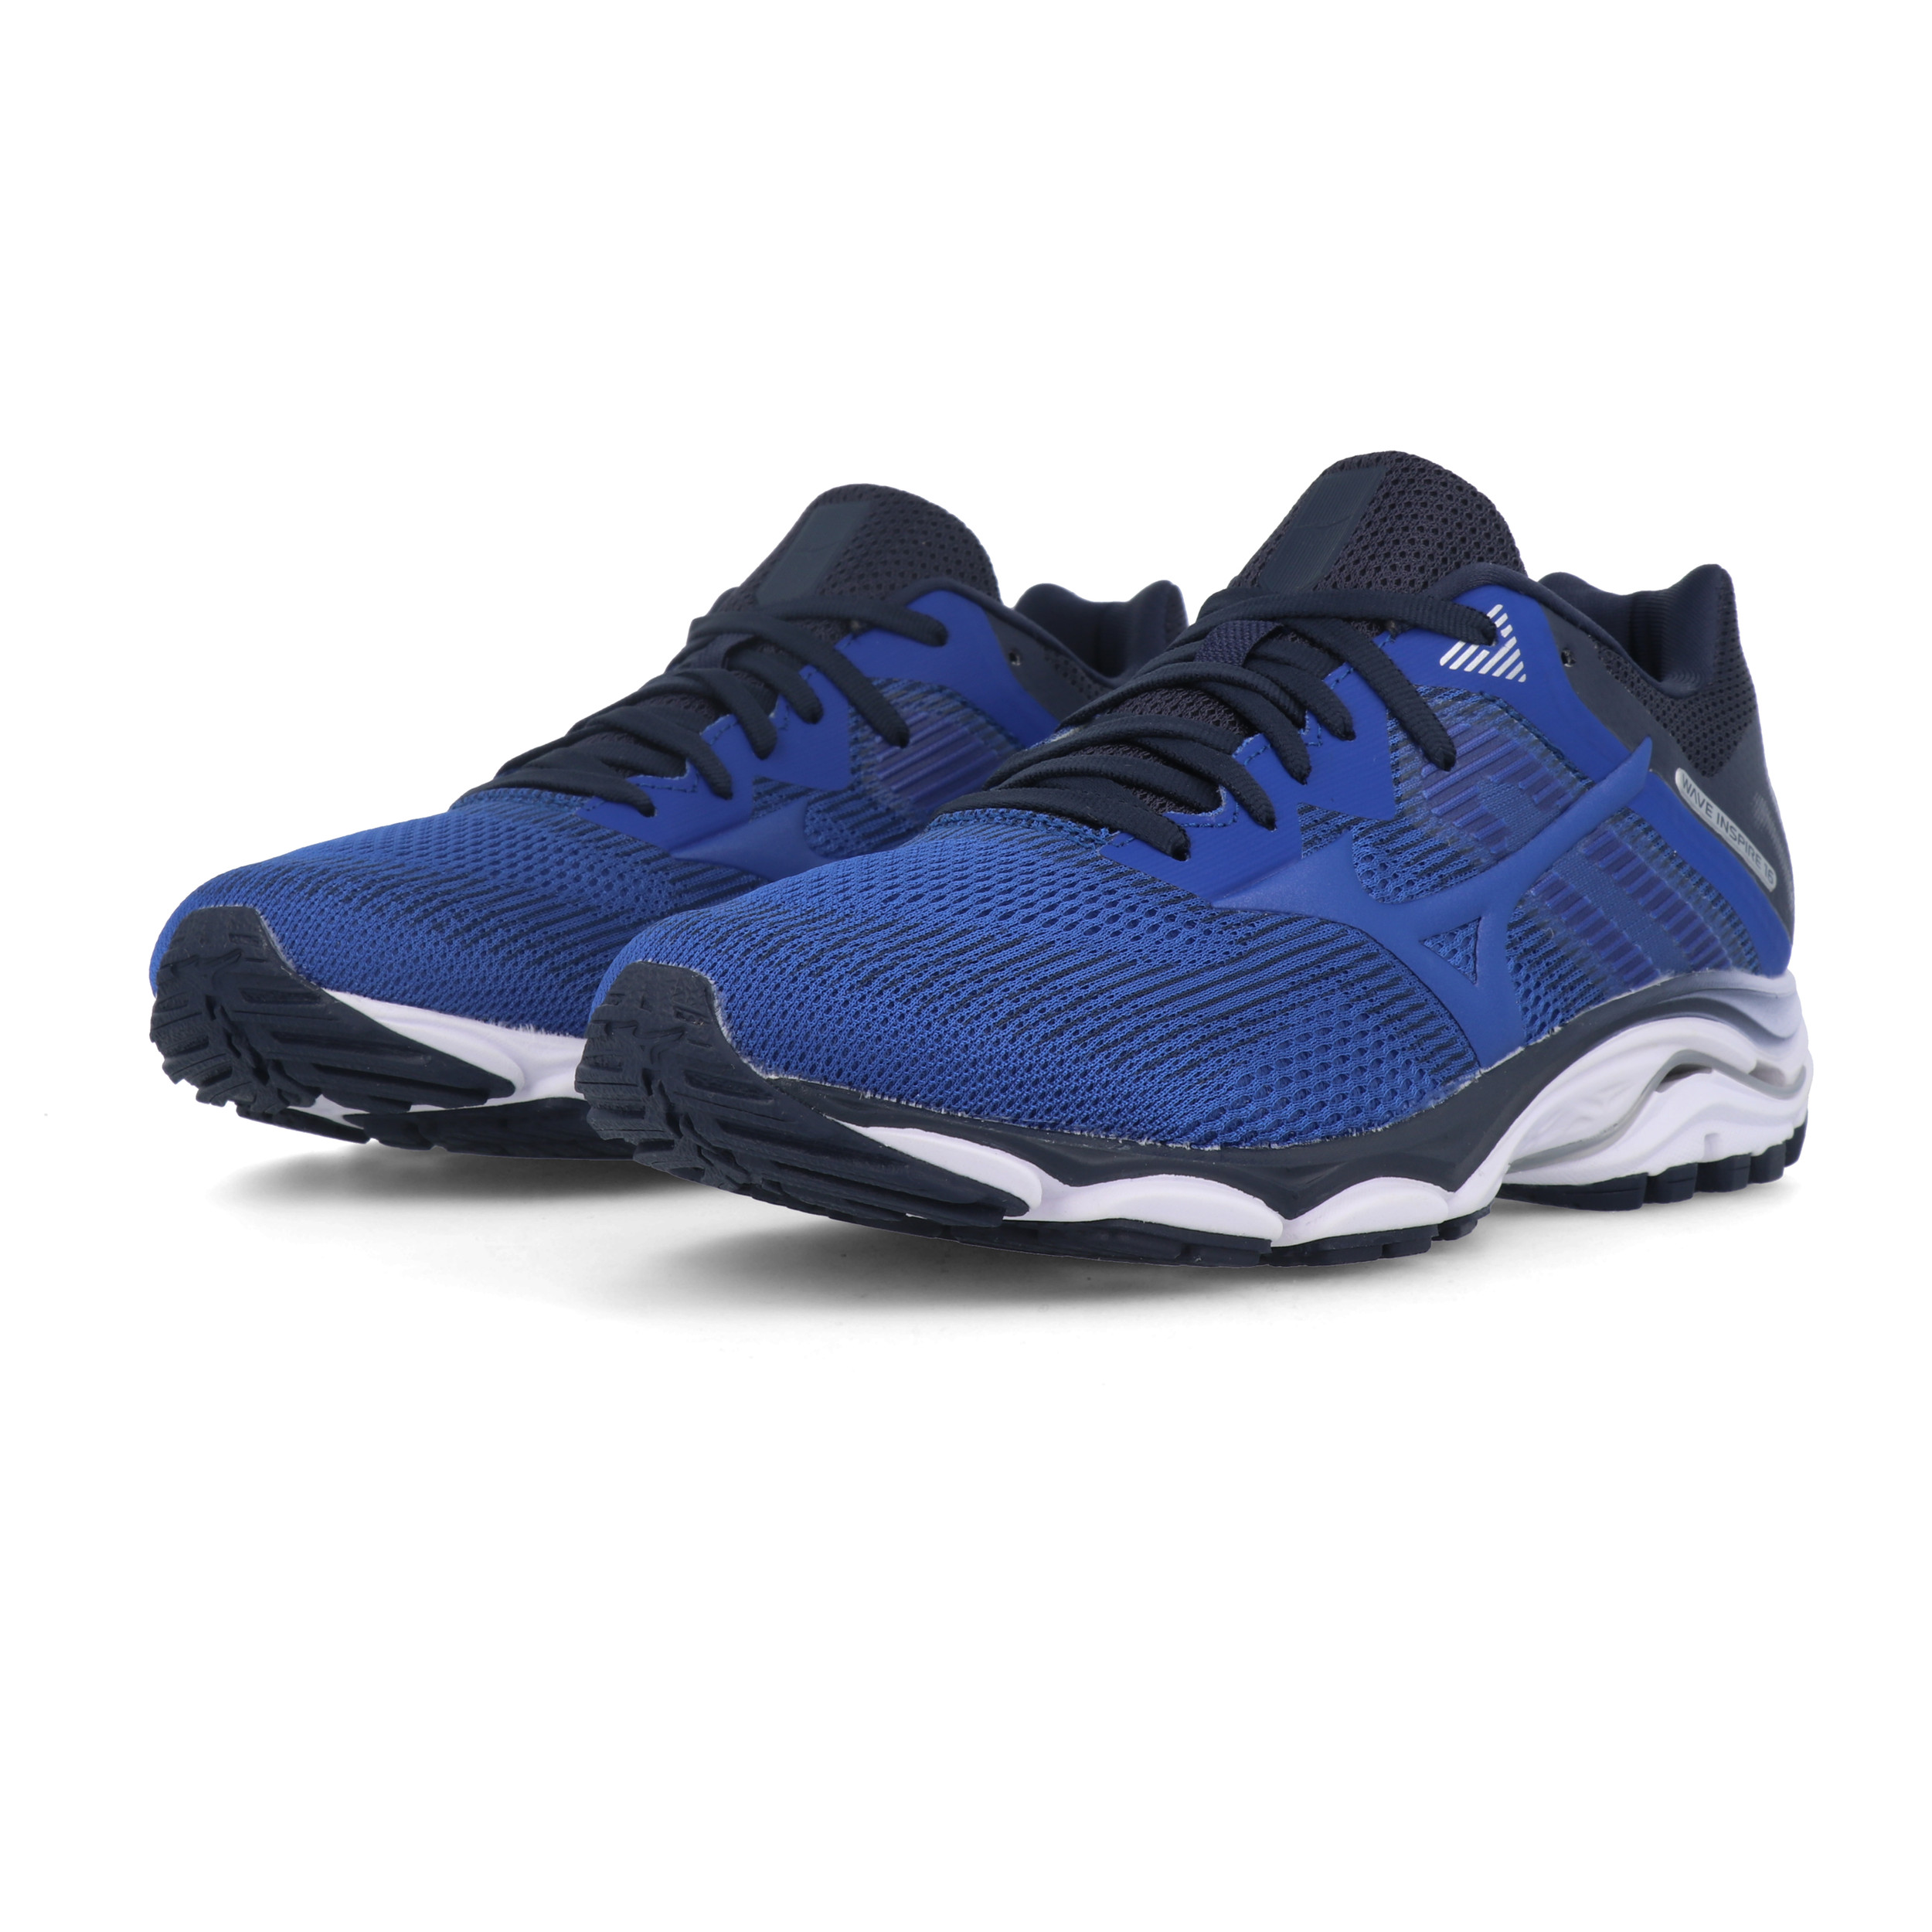 Mizuno Wave Inspire 16 Running Shoes - SS20